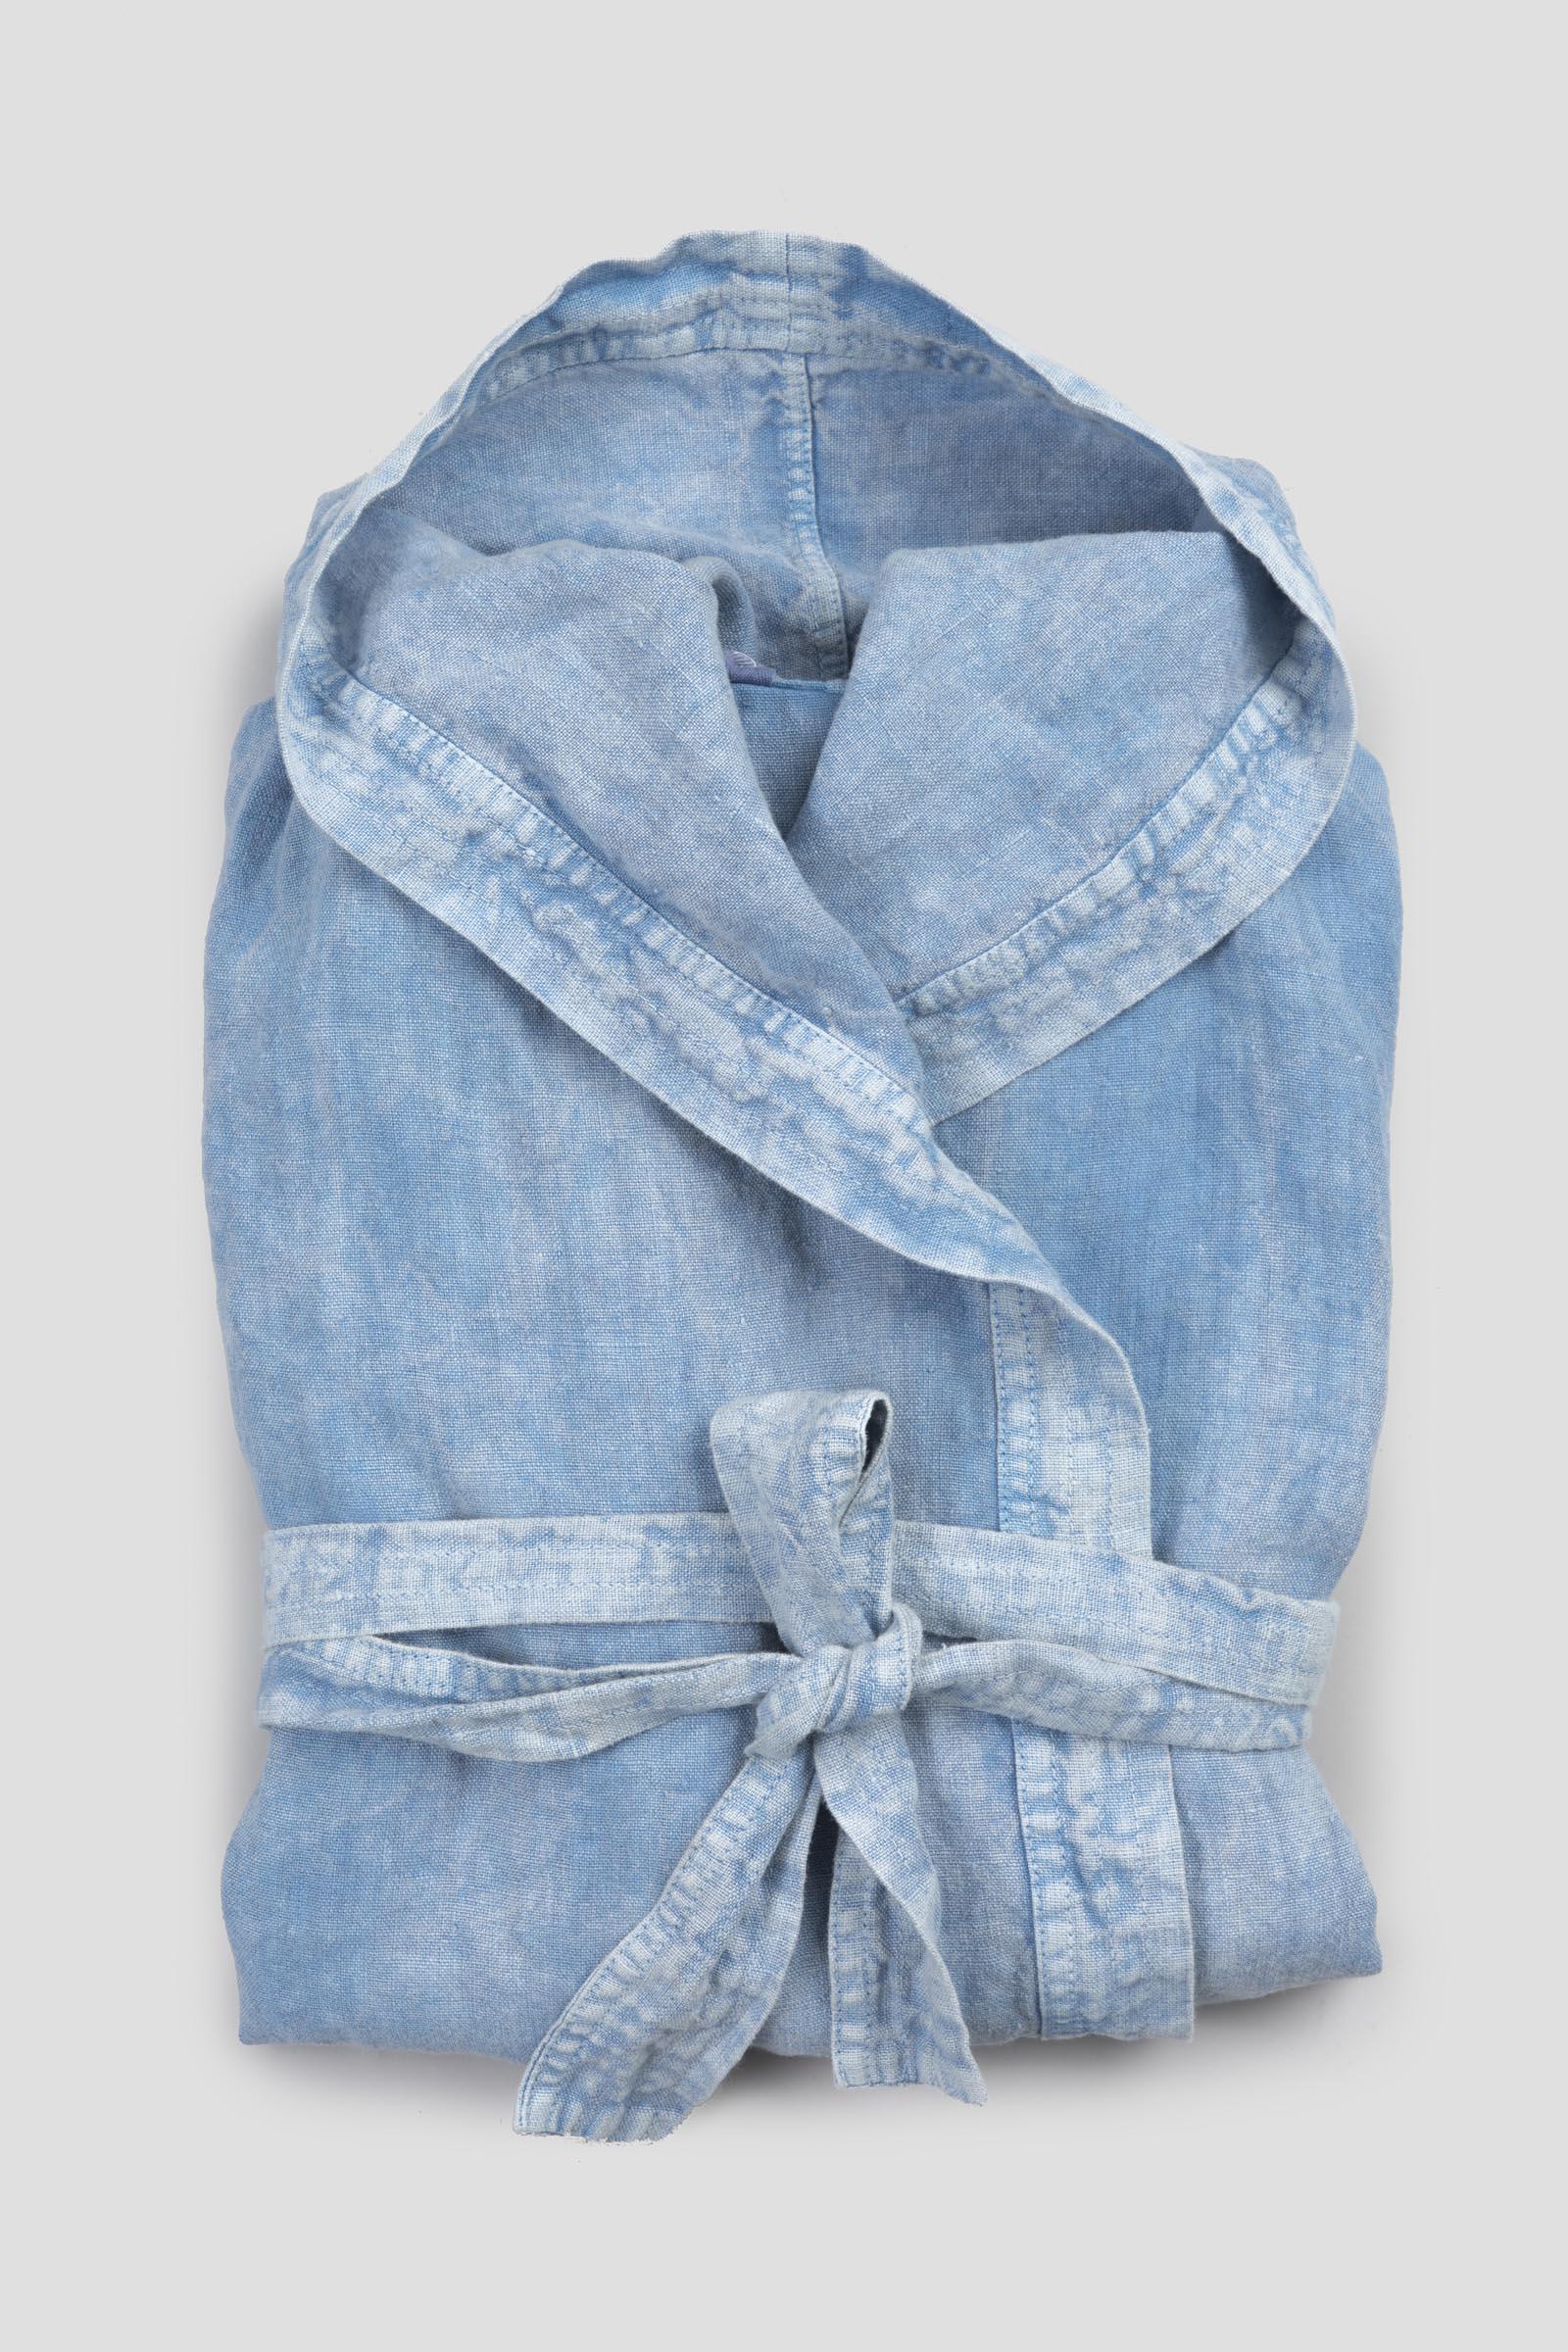 Heavy Linen Bathrobe With Hood Arte Pura